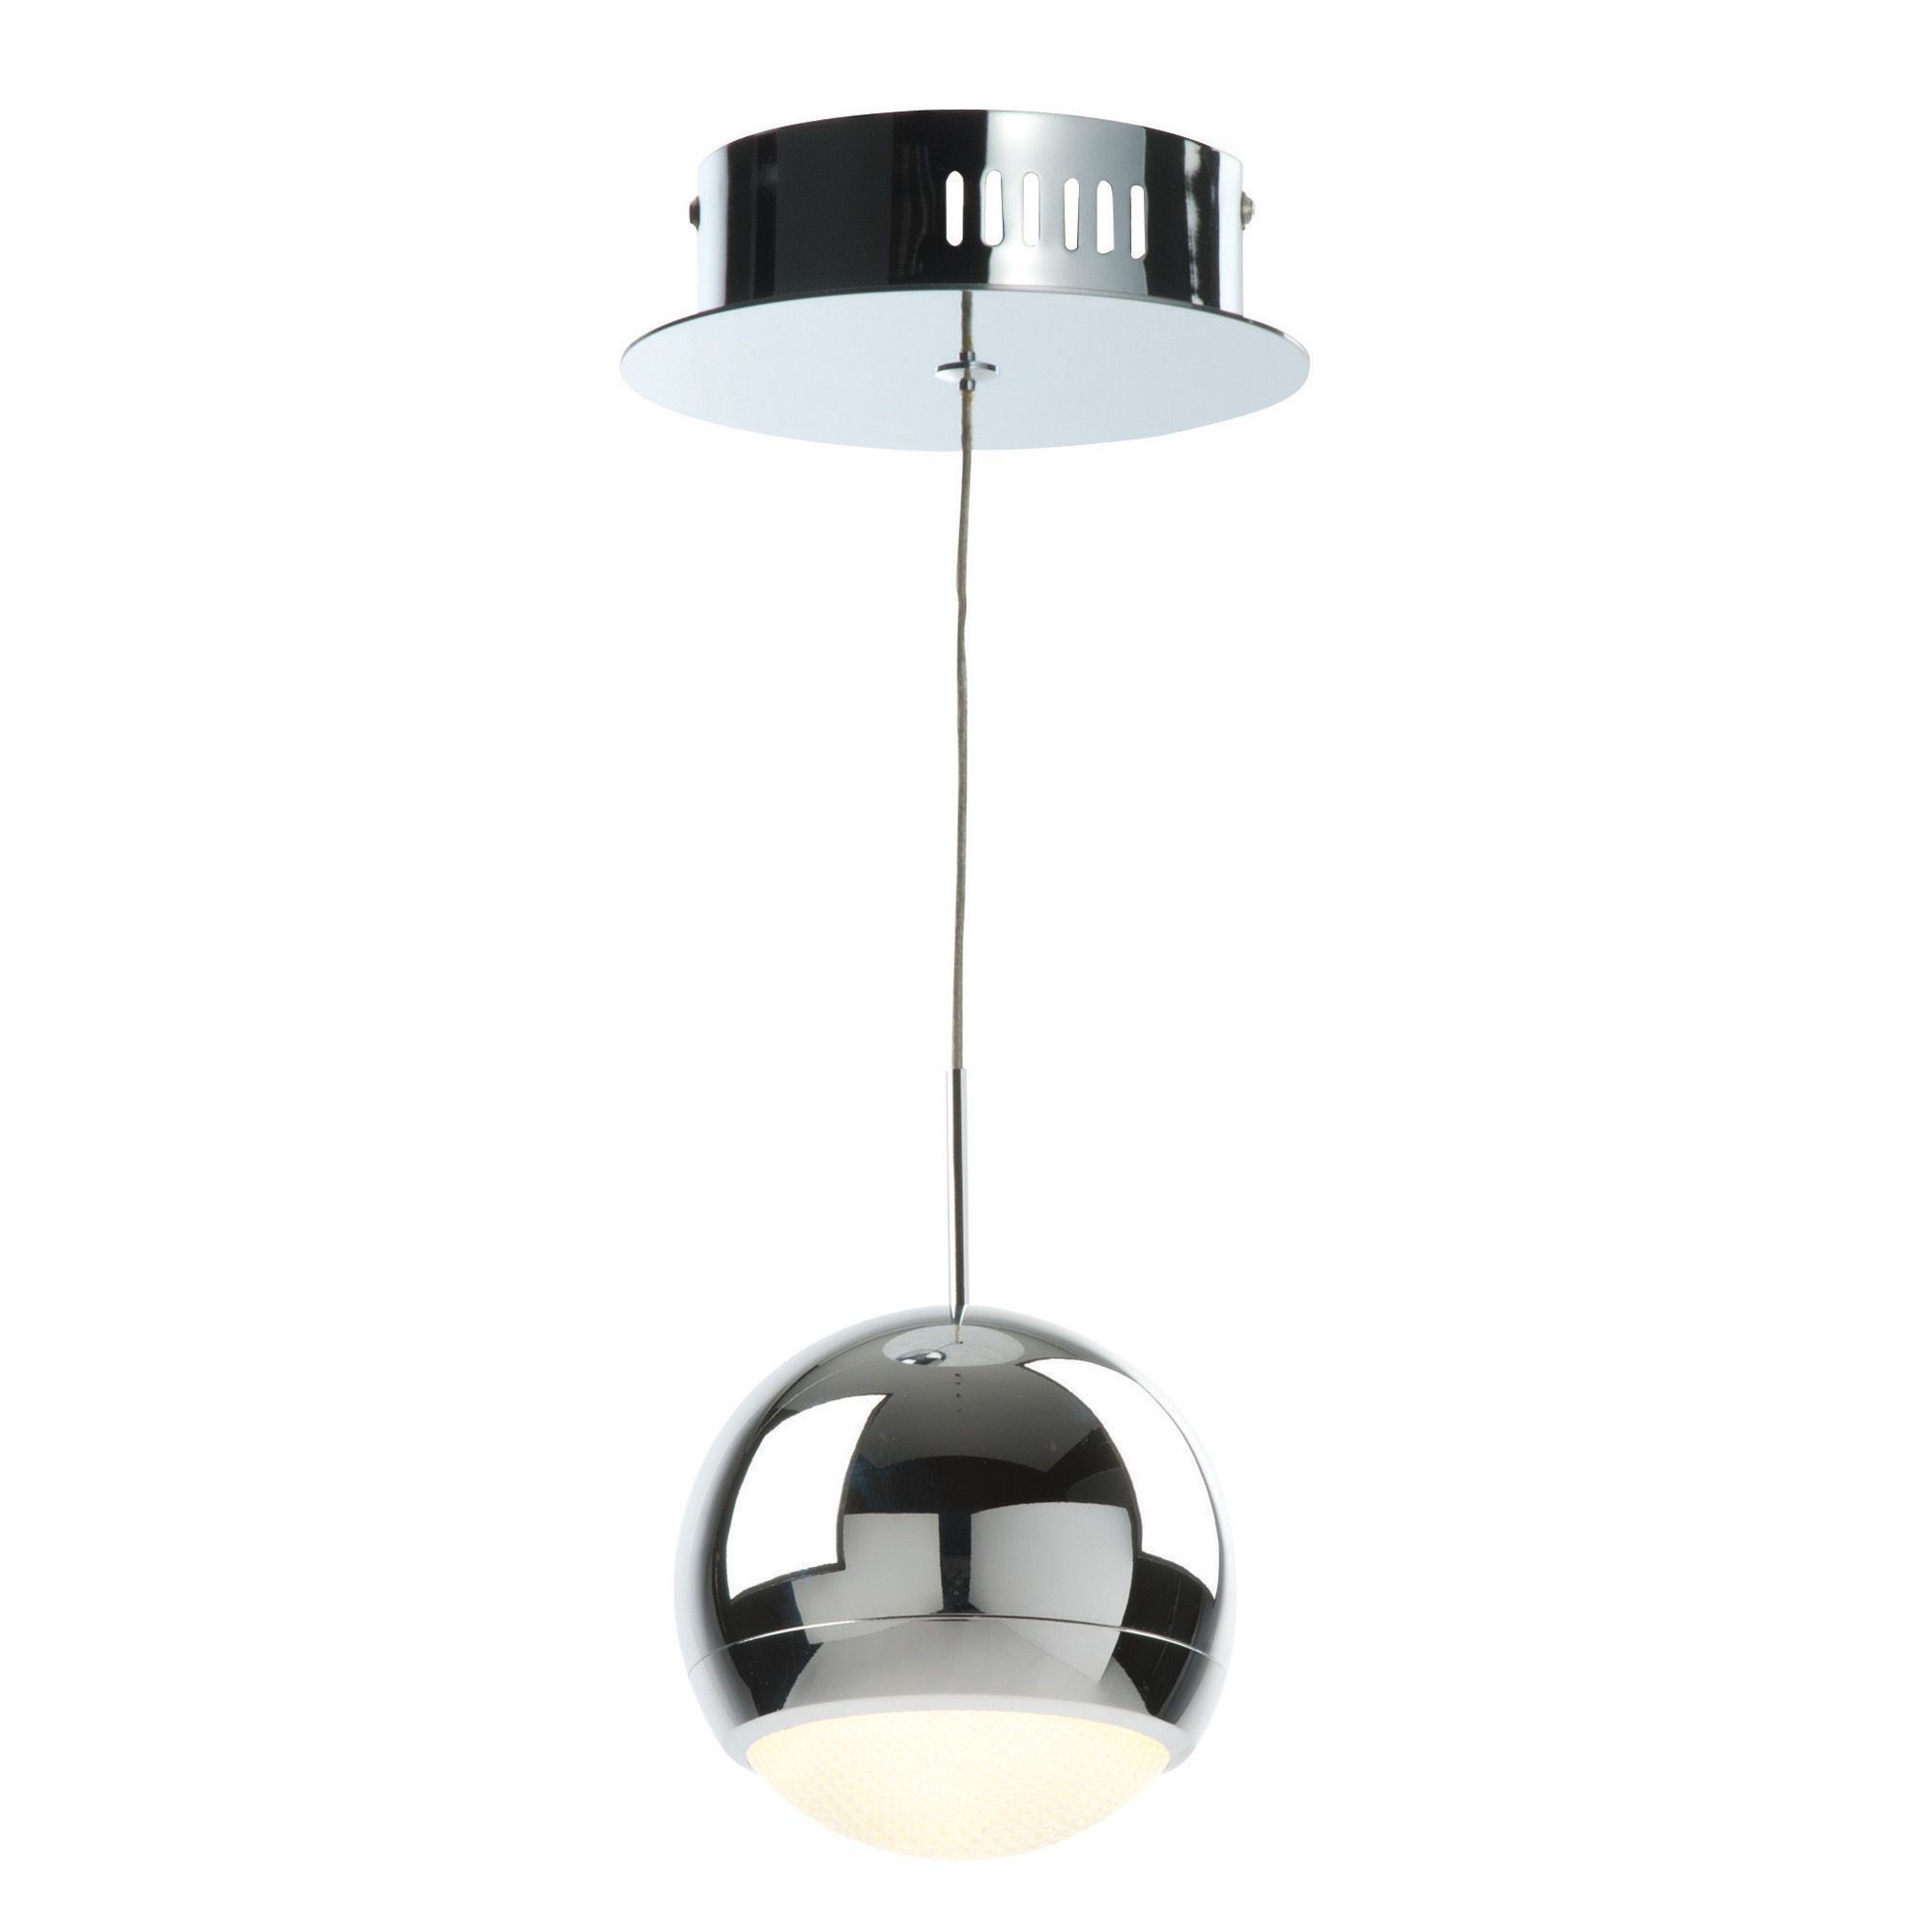 Ceiling Lights Chrome : Solent cage chrome effect pendant ceiling light